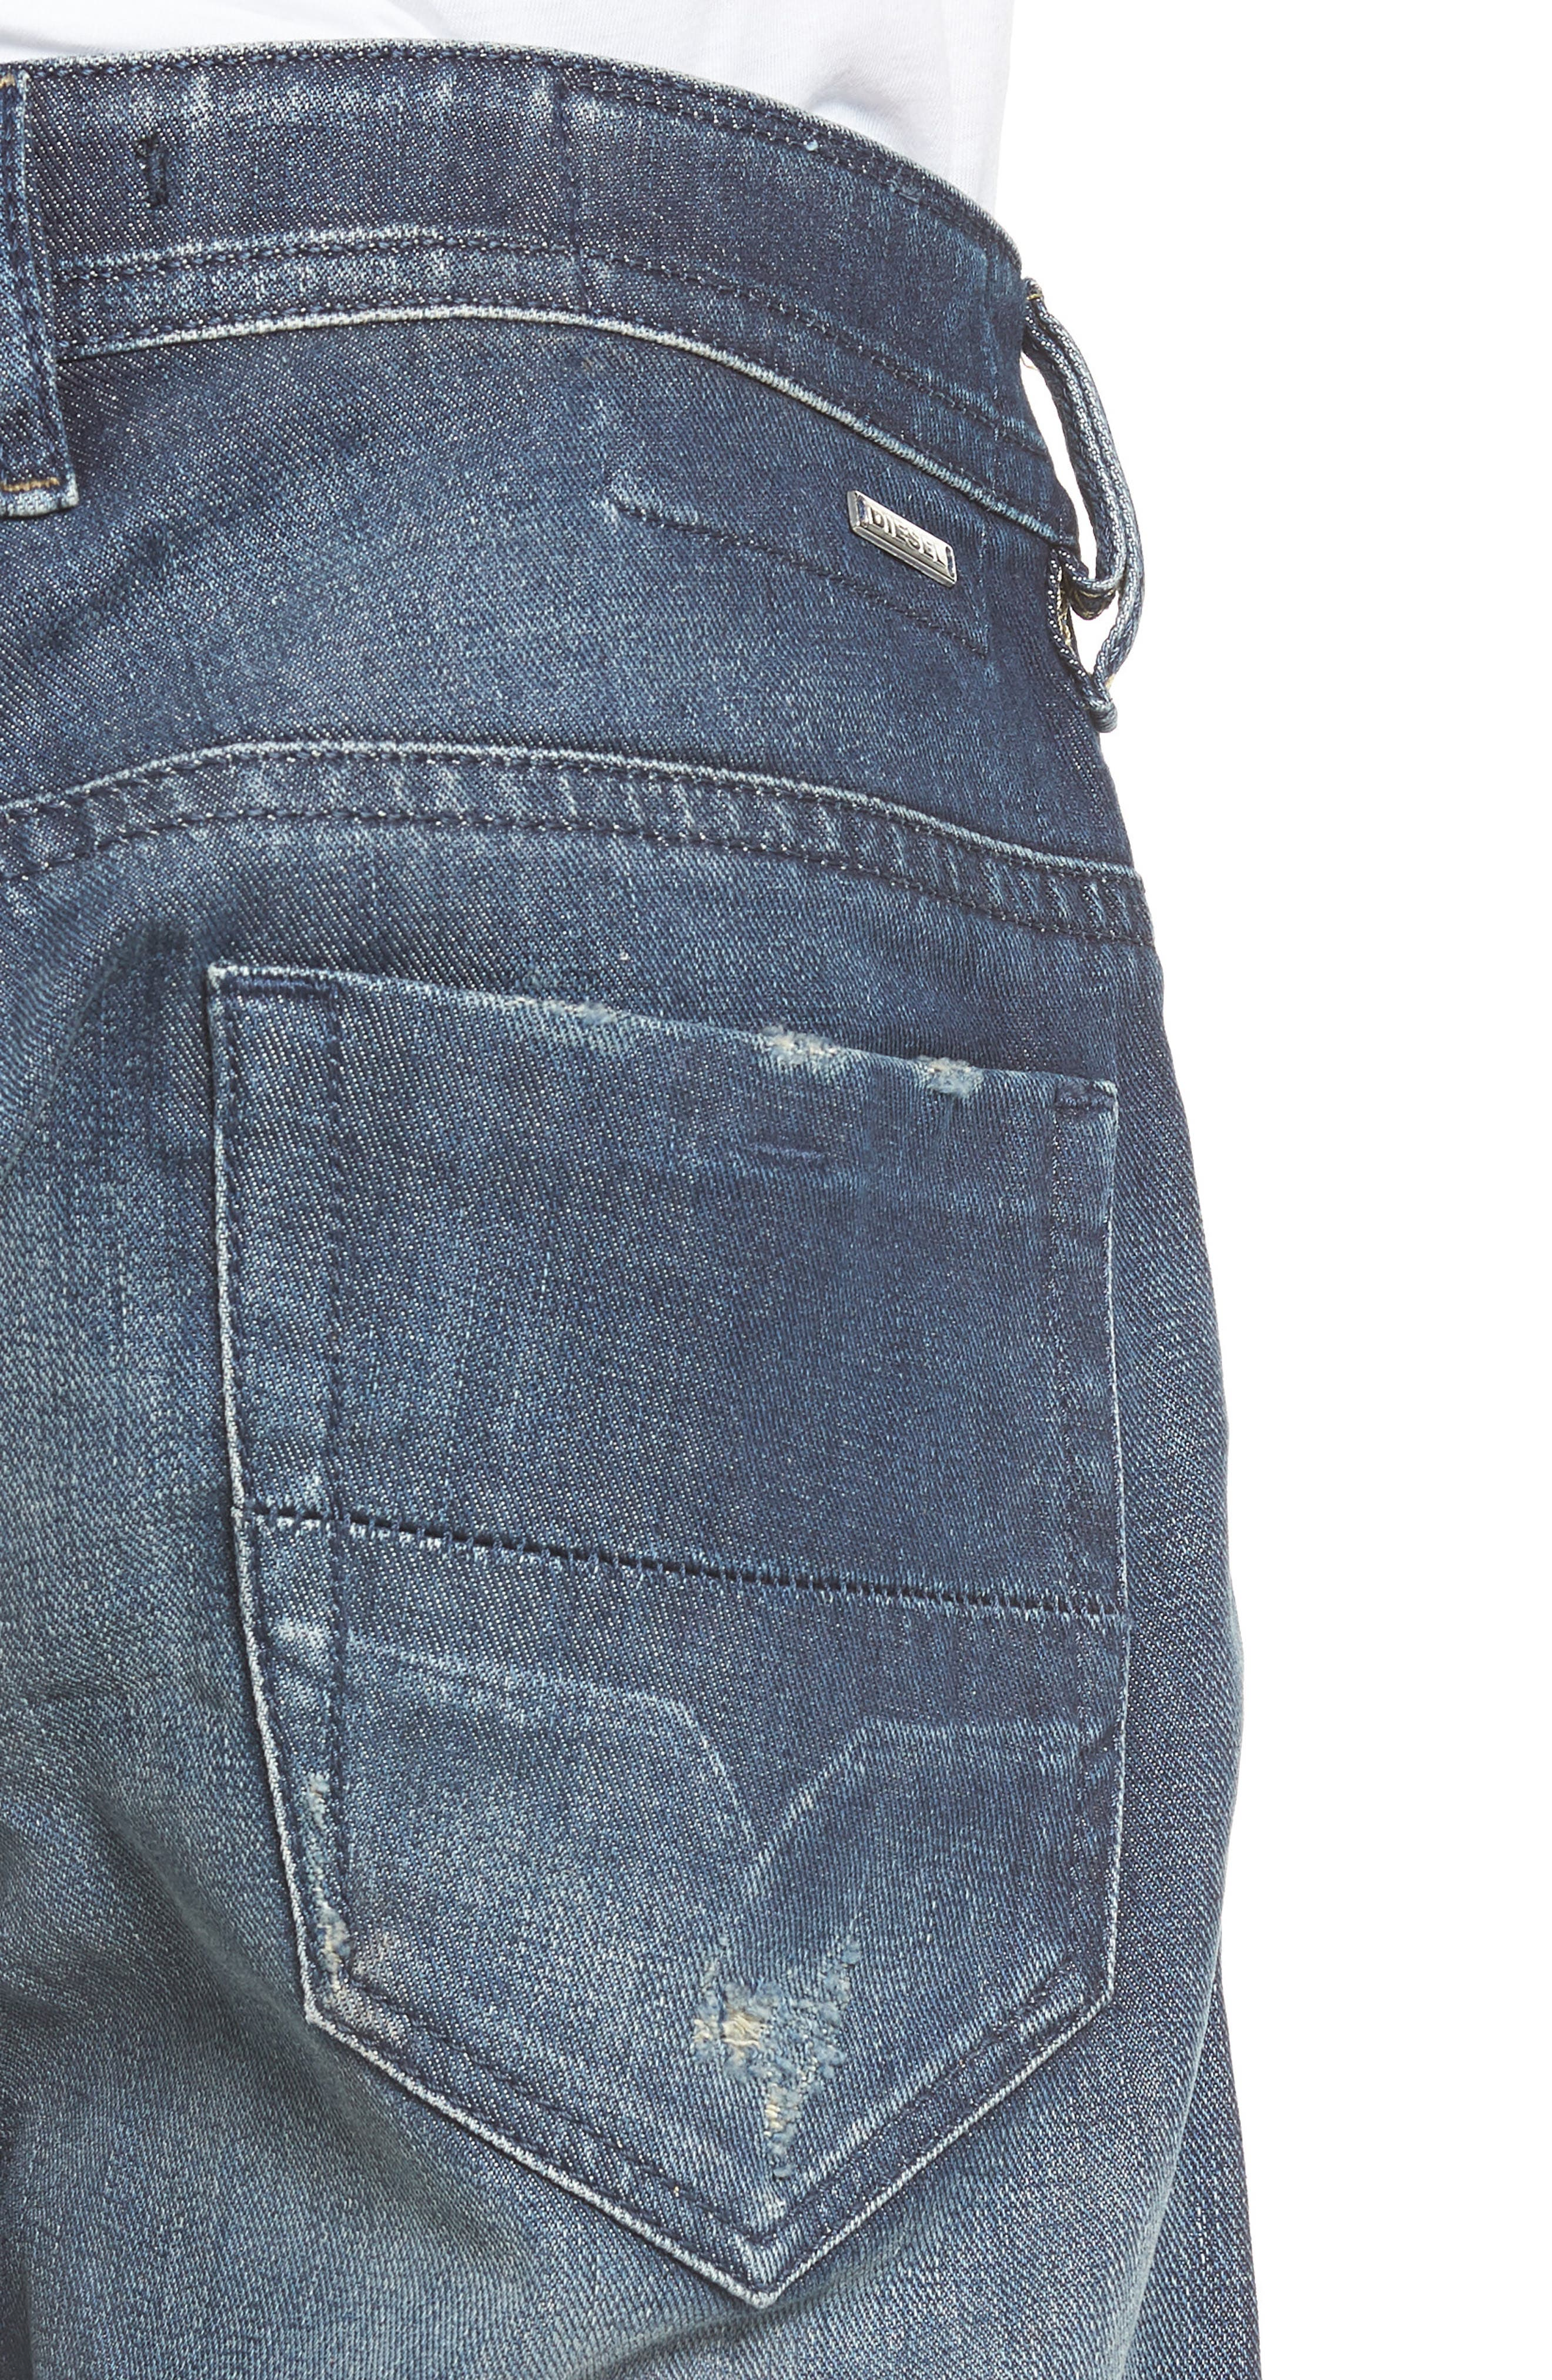 Thommer Slim Fit Jeans,                             Alternate thumbnail 4, color,